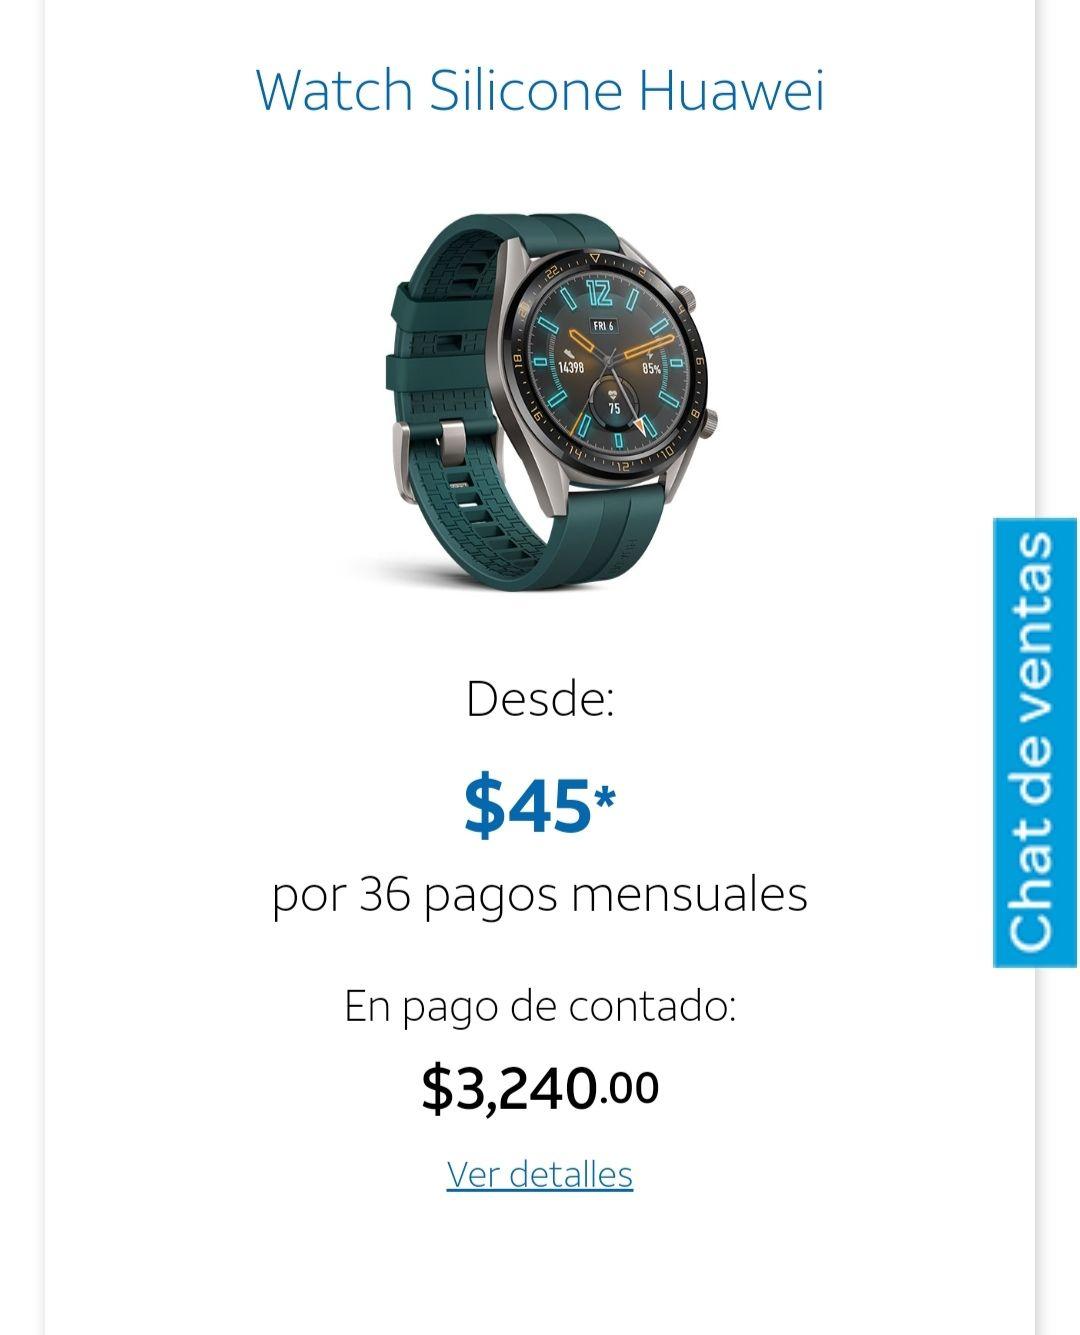 AT&T: Huawei Watch